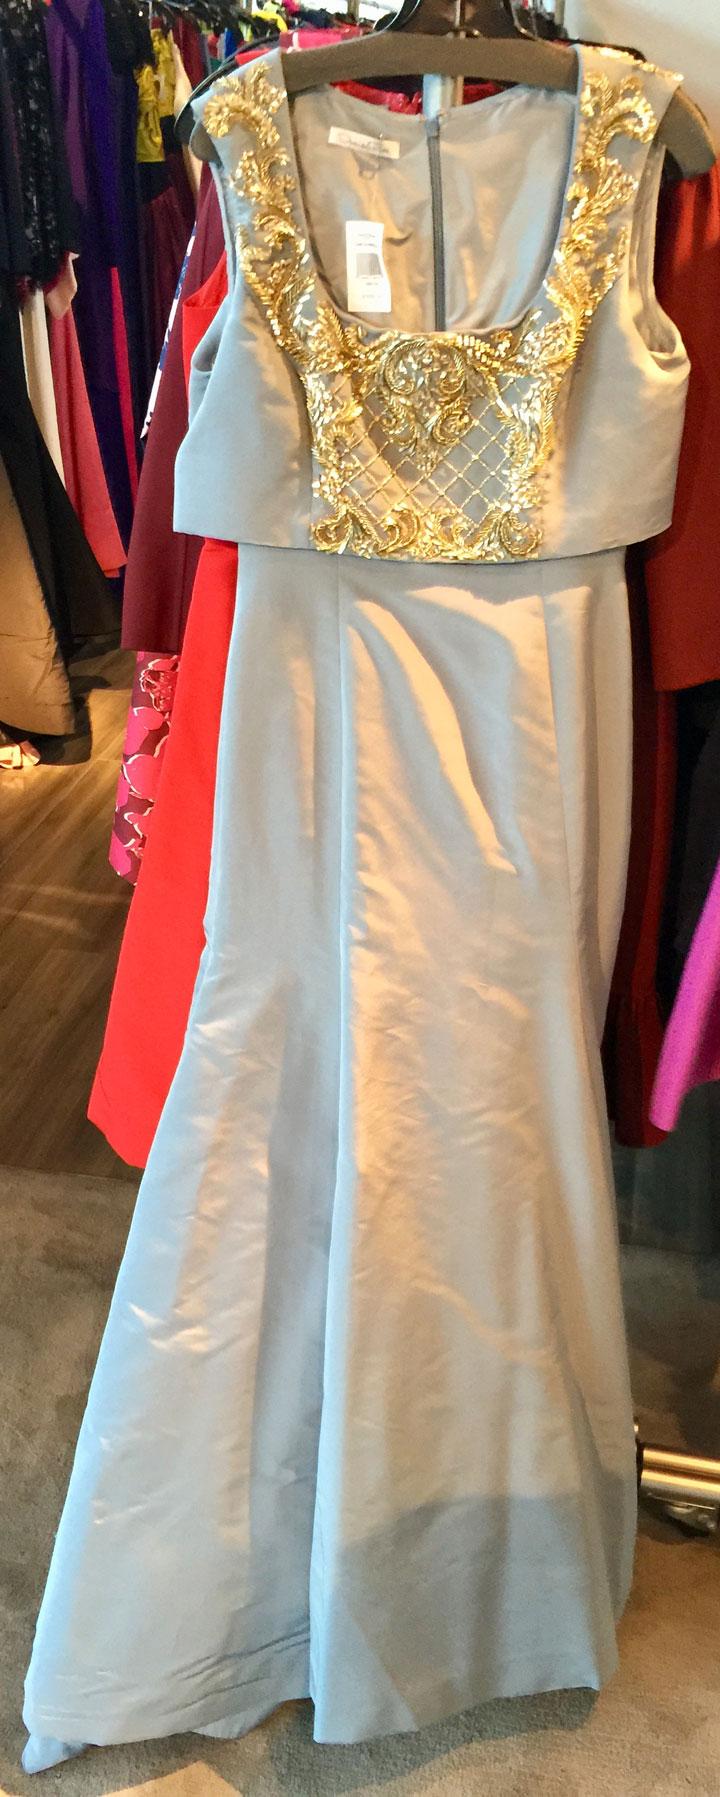 Oscar de la Renta LA Sample Sale Gown